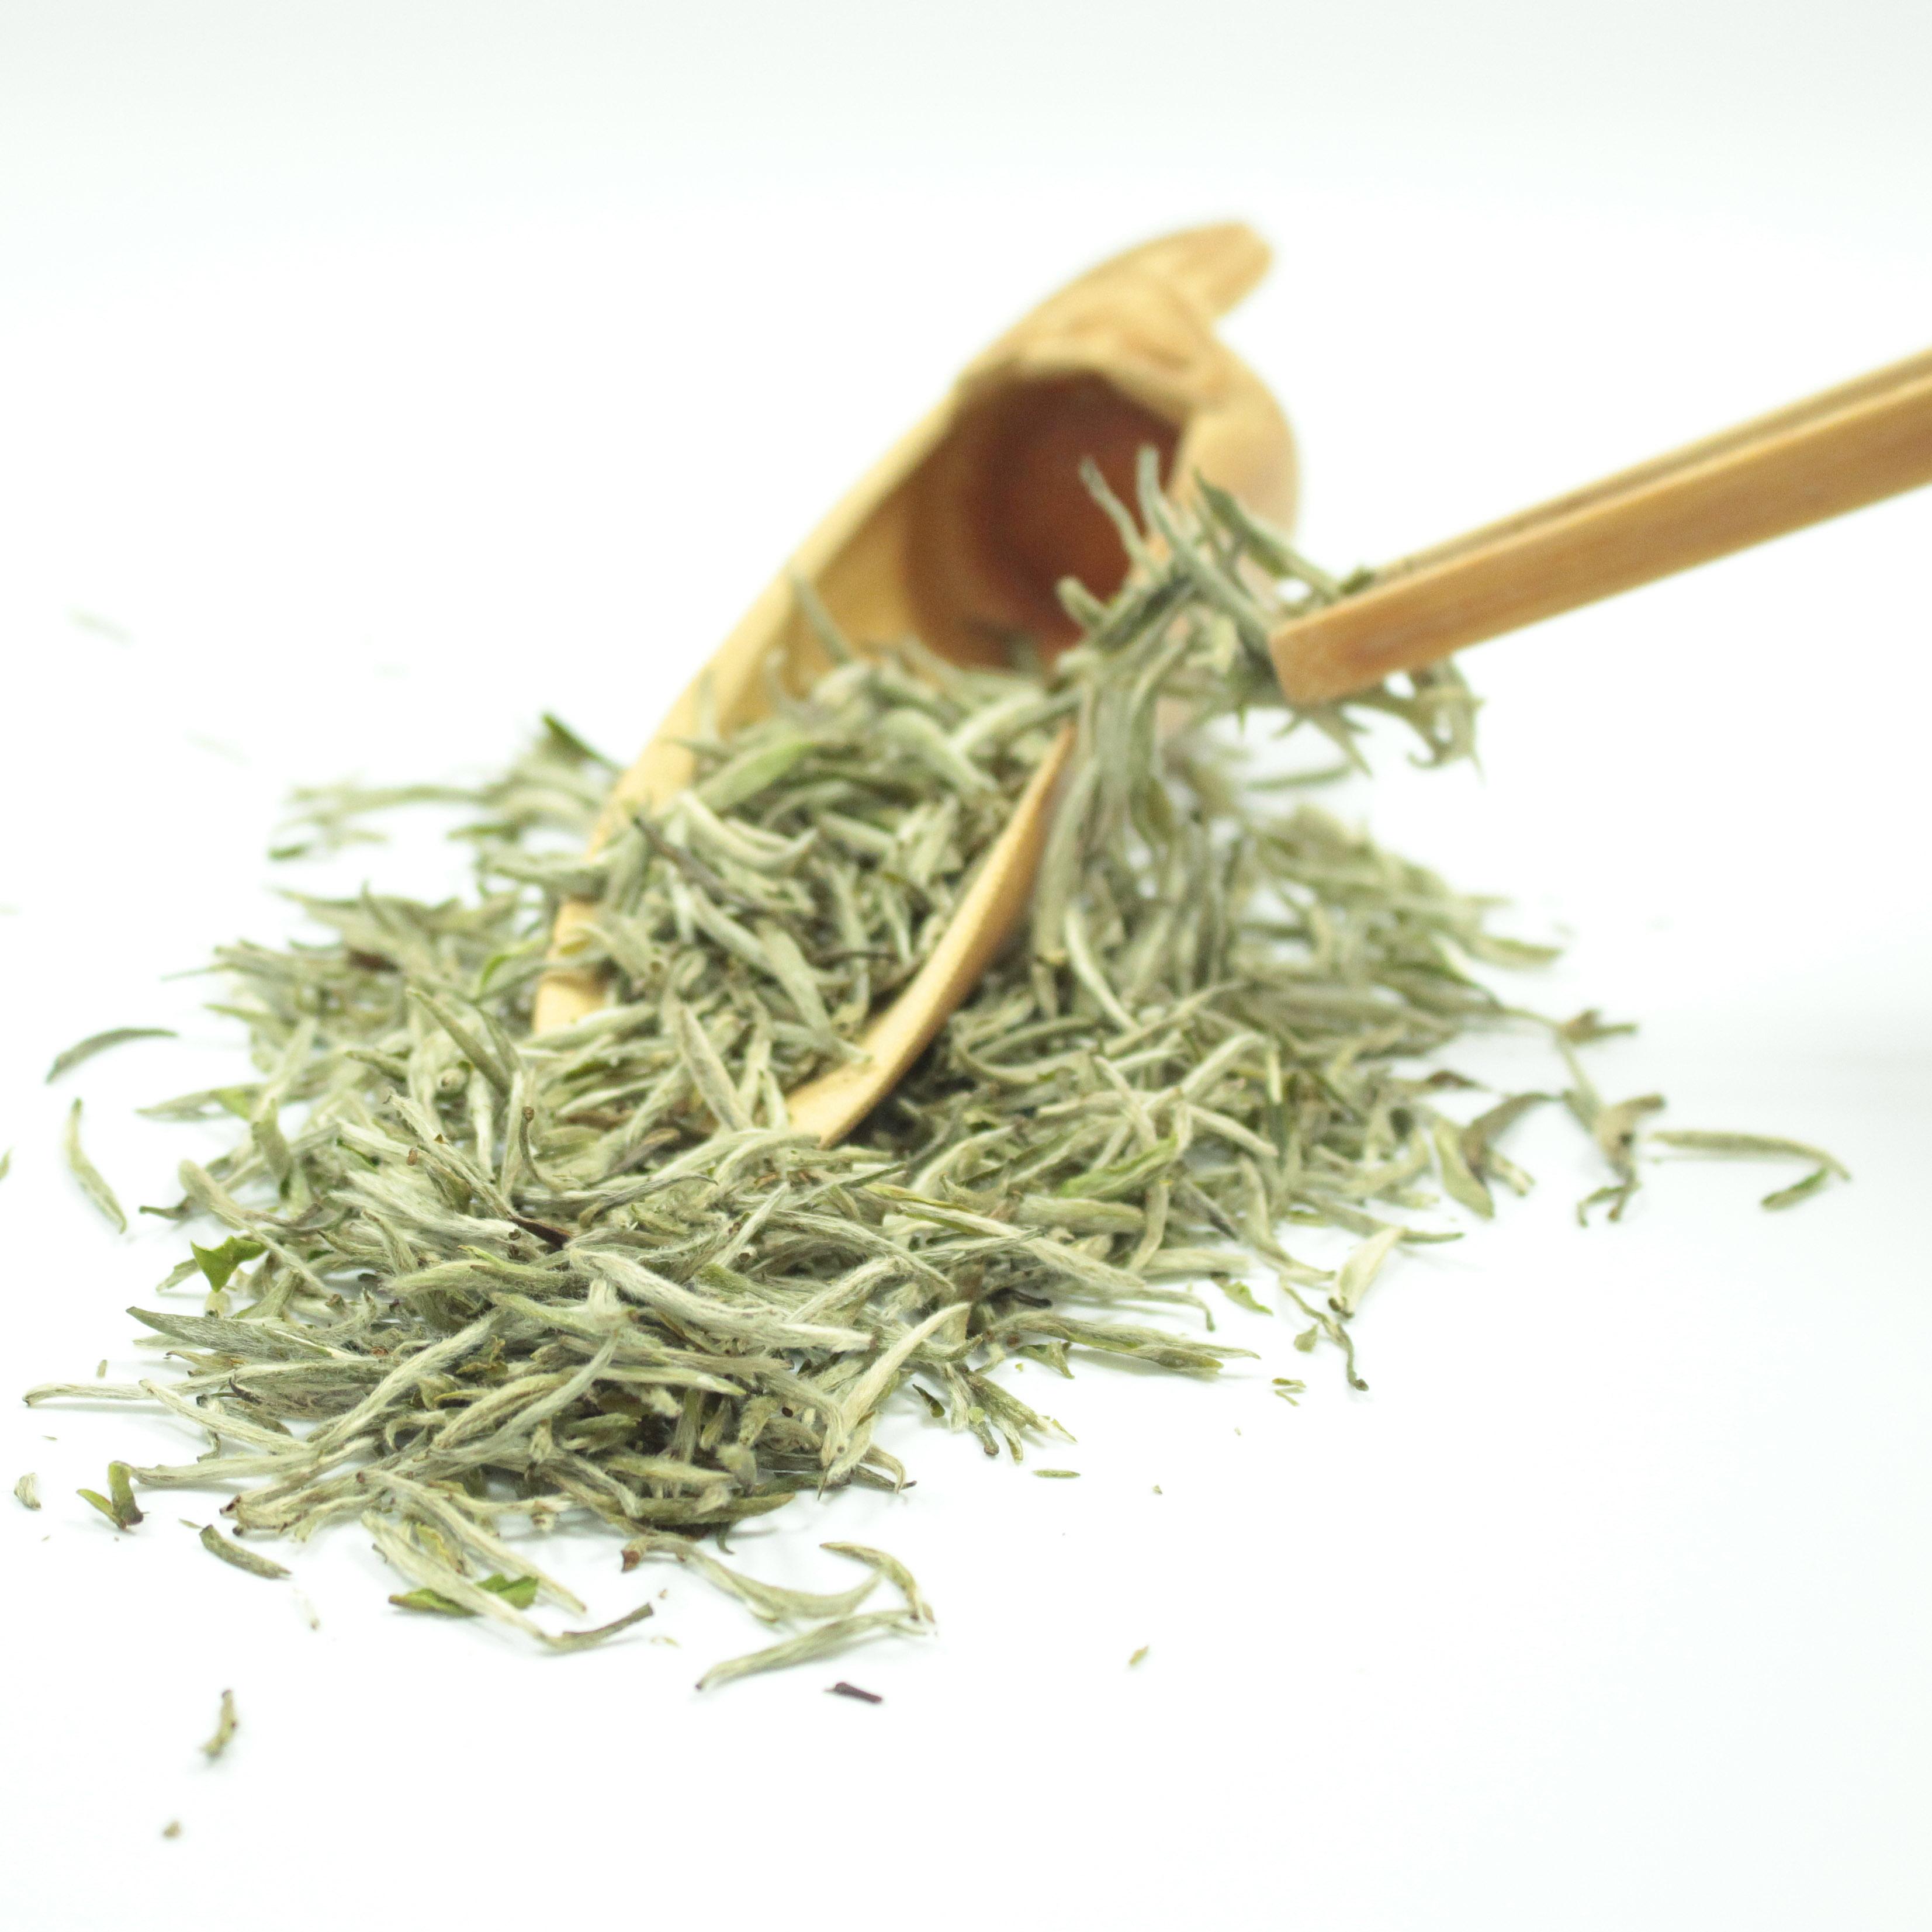 Silver Needle/bai hao yin zhen white loose leaf tea organic quality - 4uTea   4uTea.com